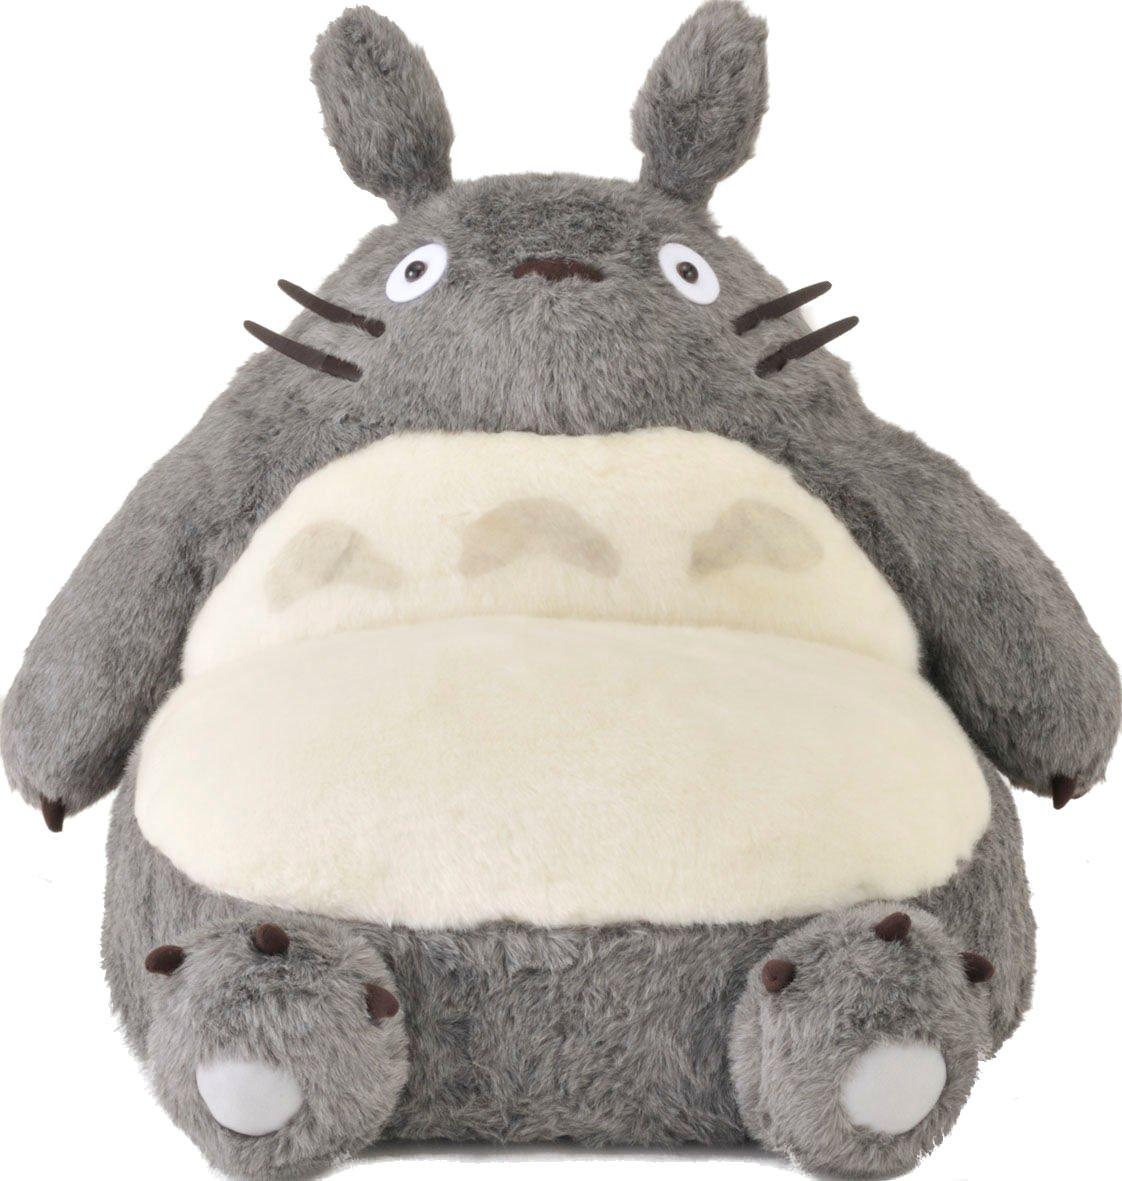 Totoro bean bag chair - Totoro Bean Bag Chair